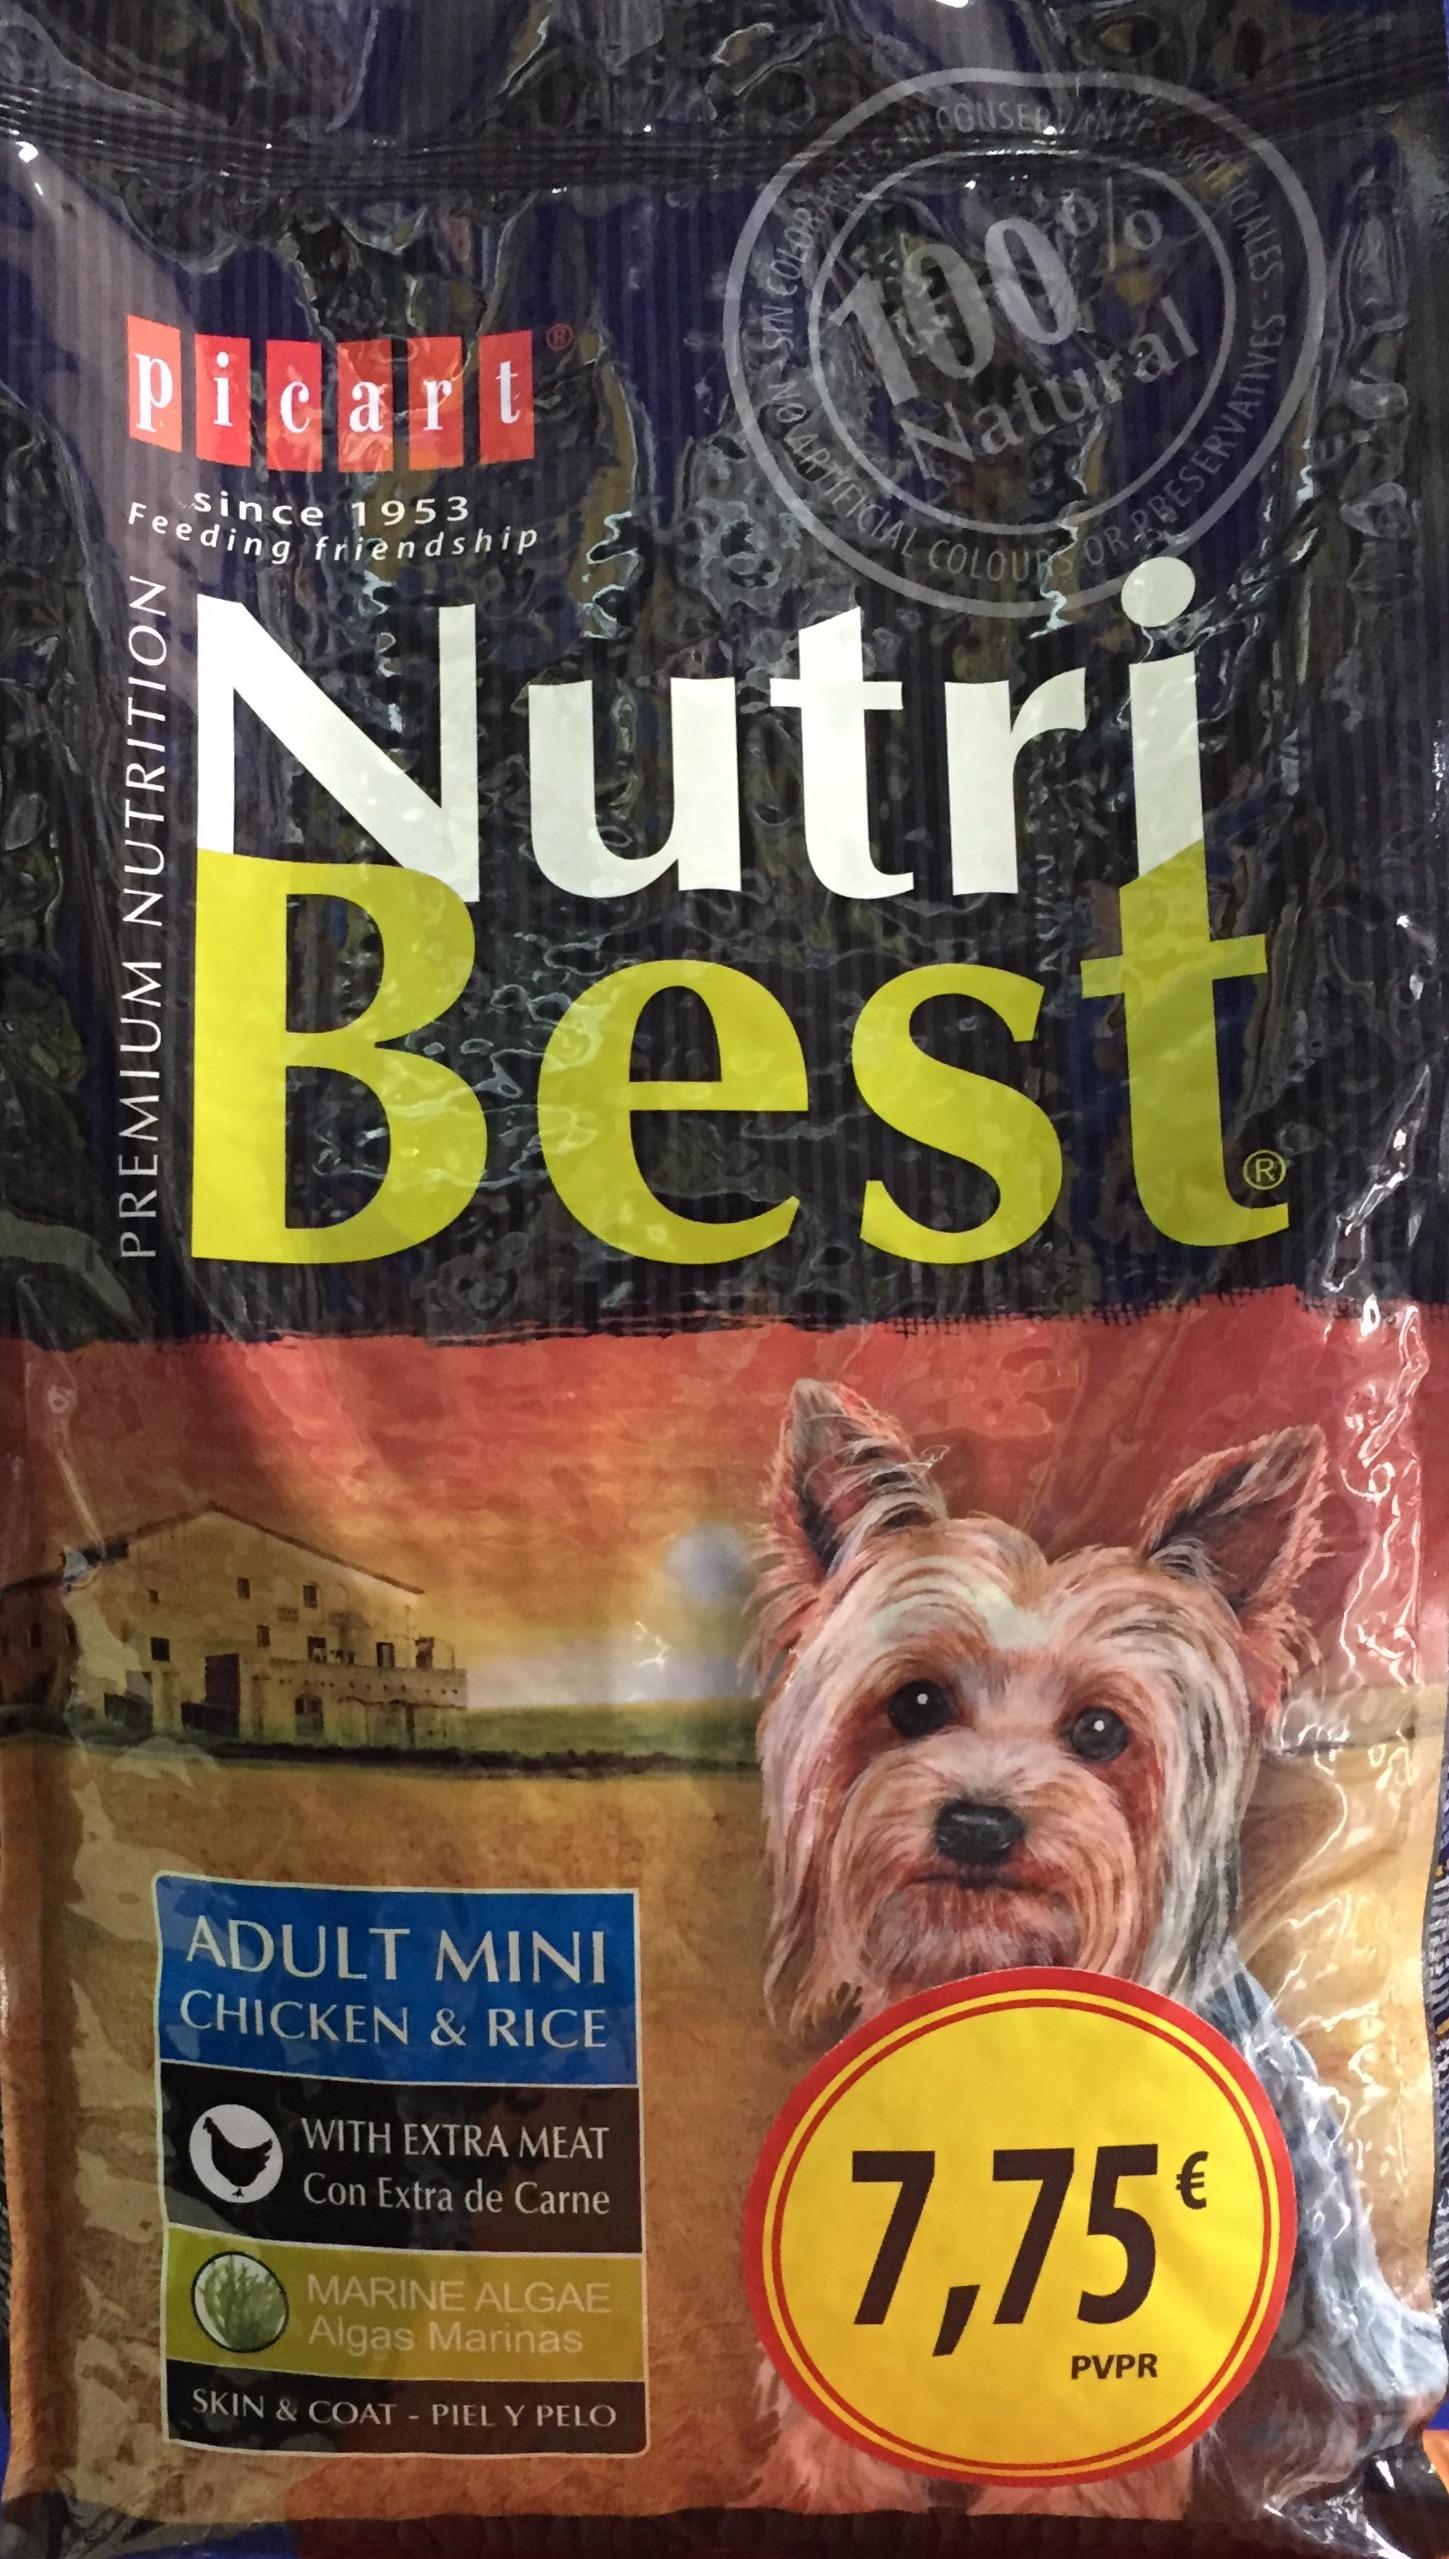 picart nutribest mini, pienso para perros.